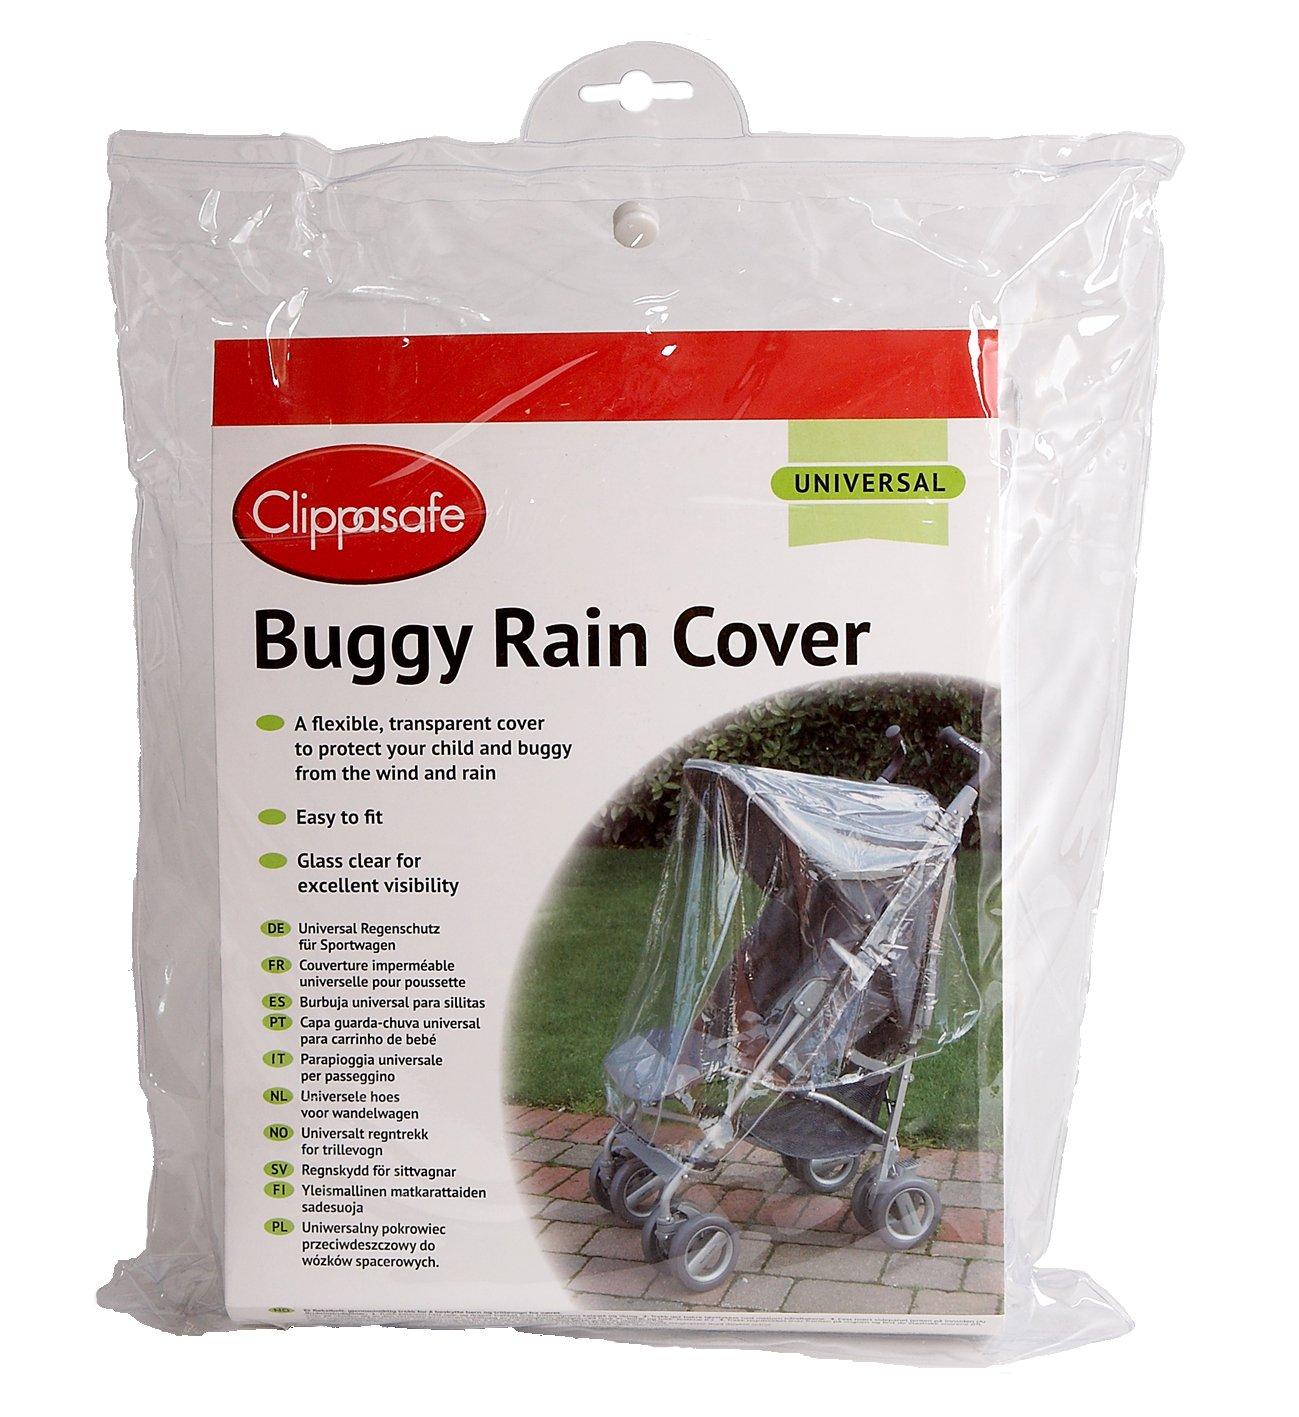 Clippasafe Universal Buggy Rain Cover Clippasafe Ltd CL245 Baby Stroller